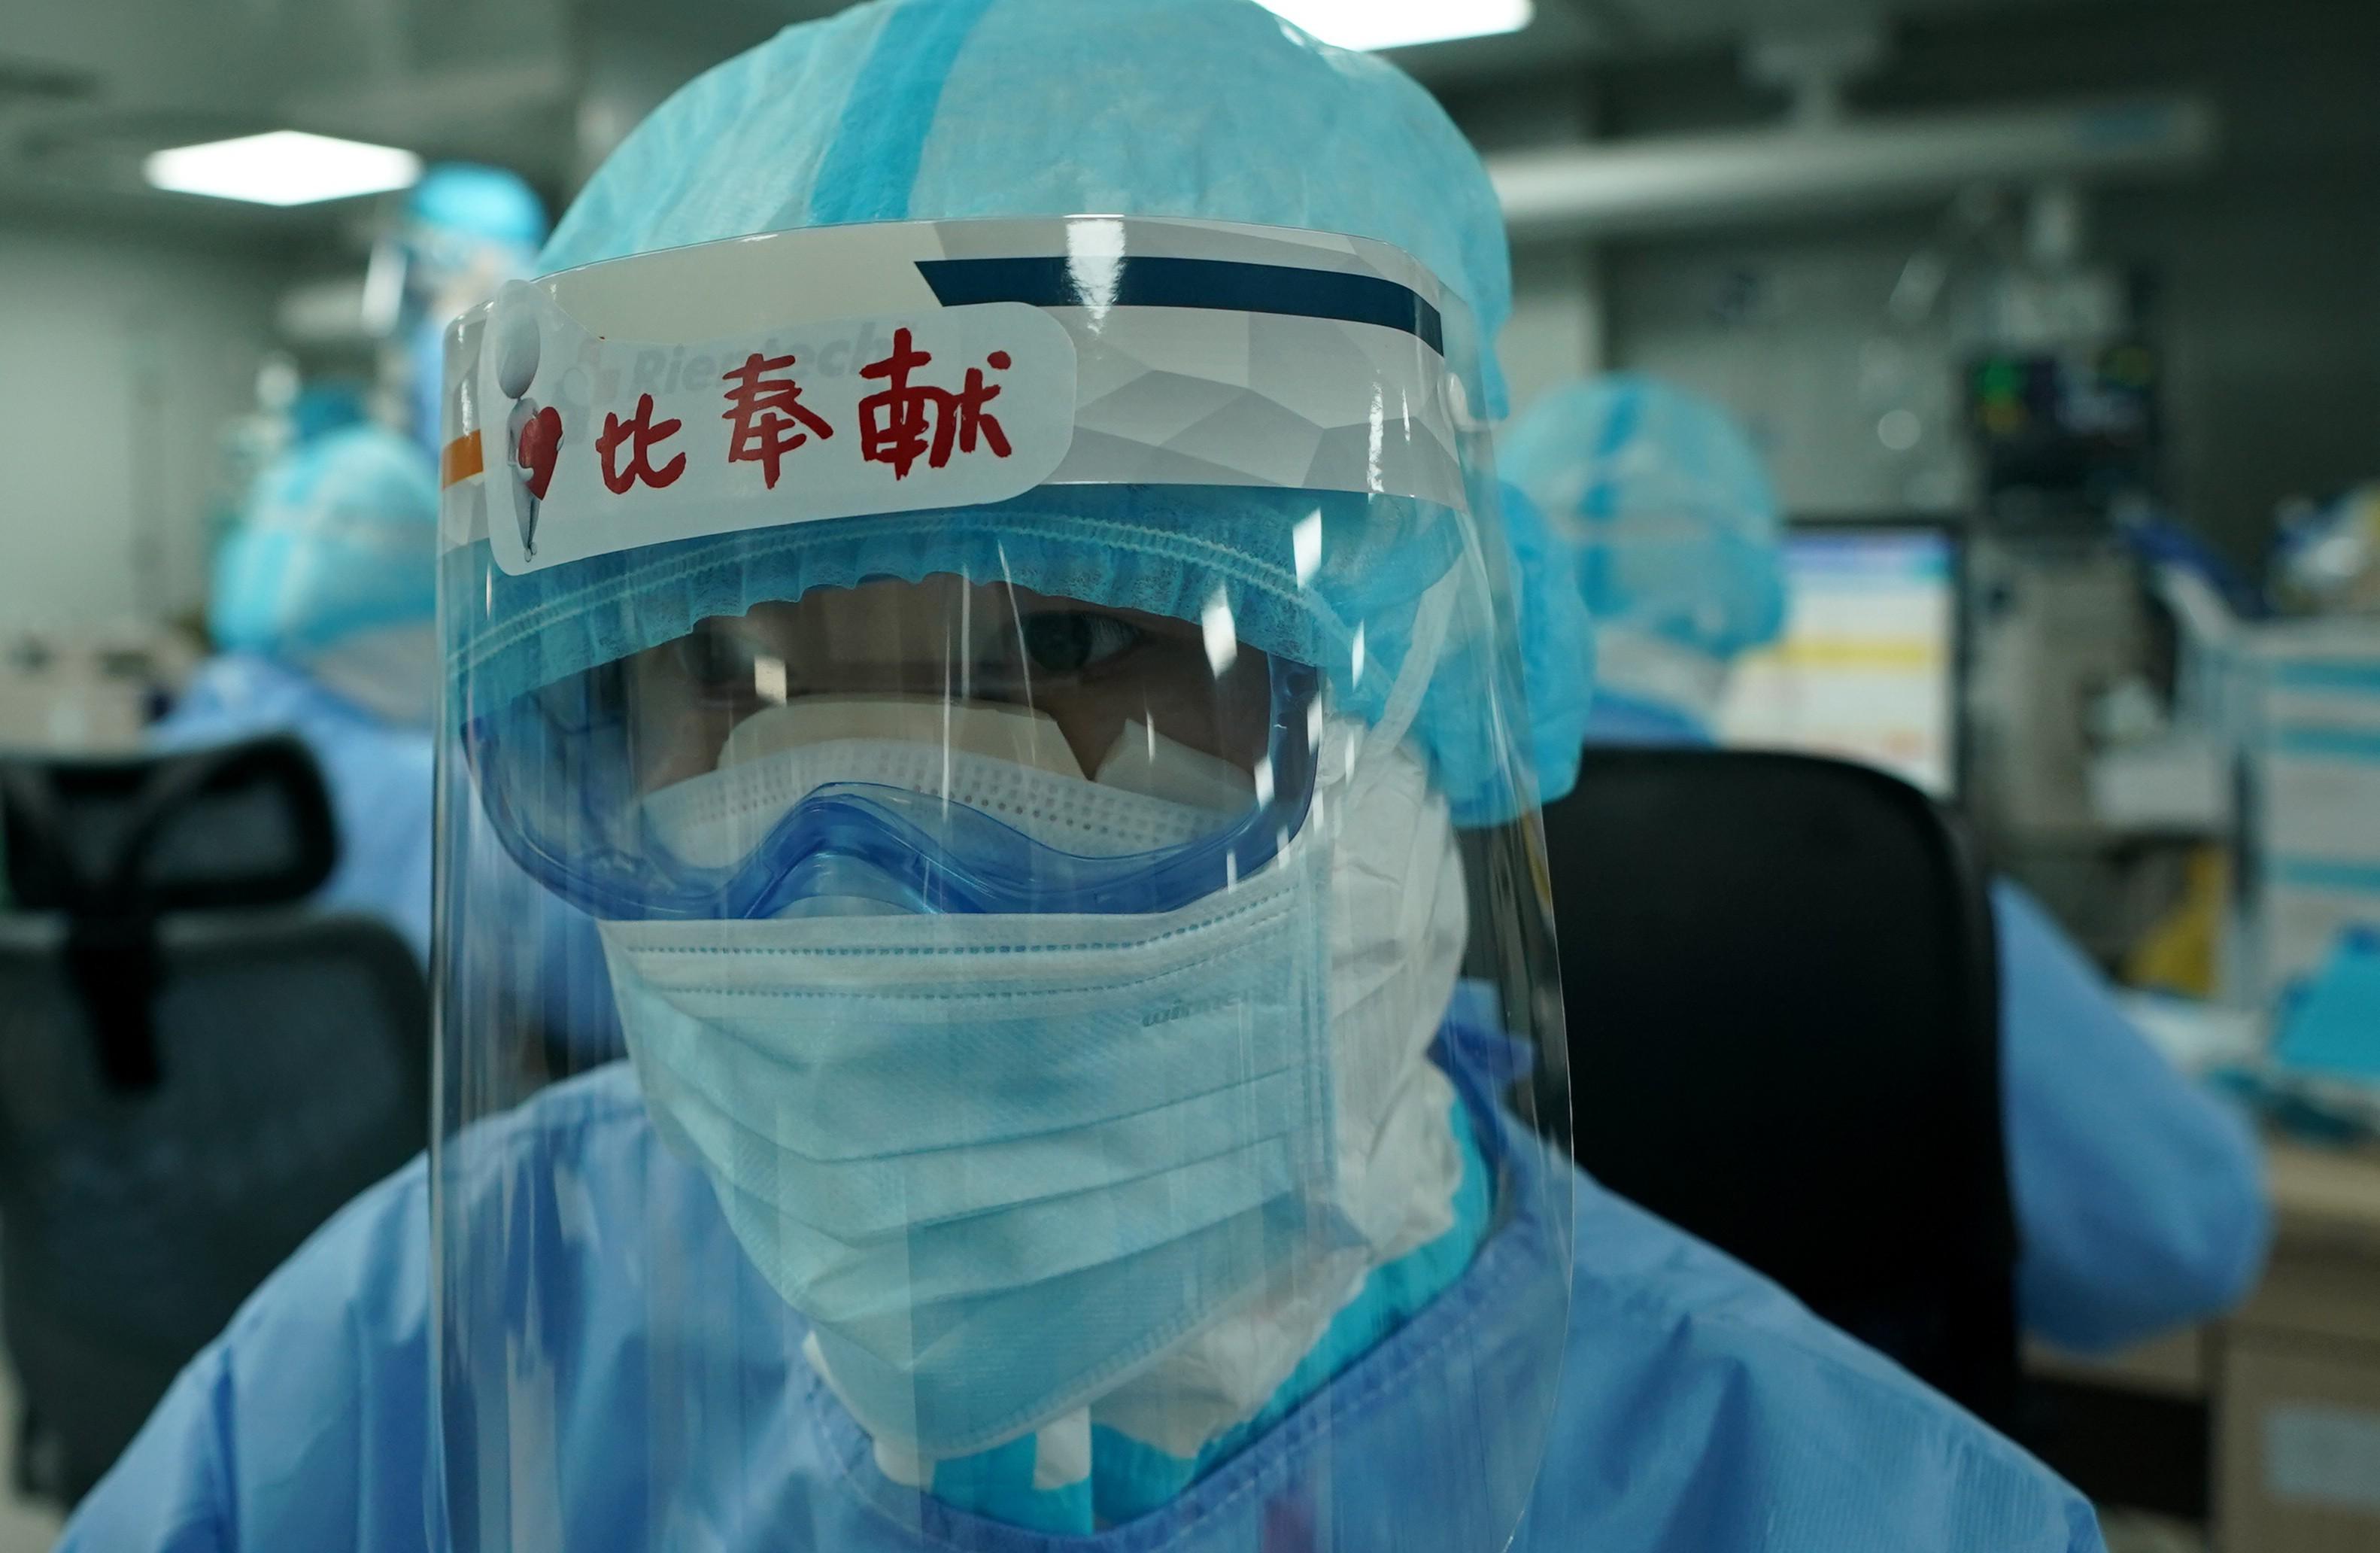 Coronavirus outbreak | South China Morning Post